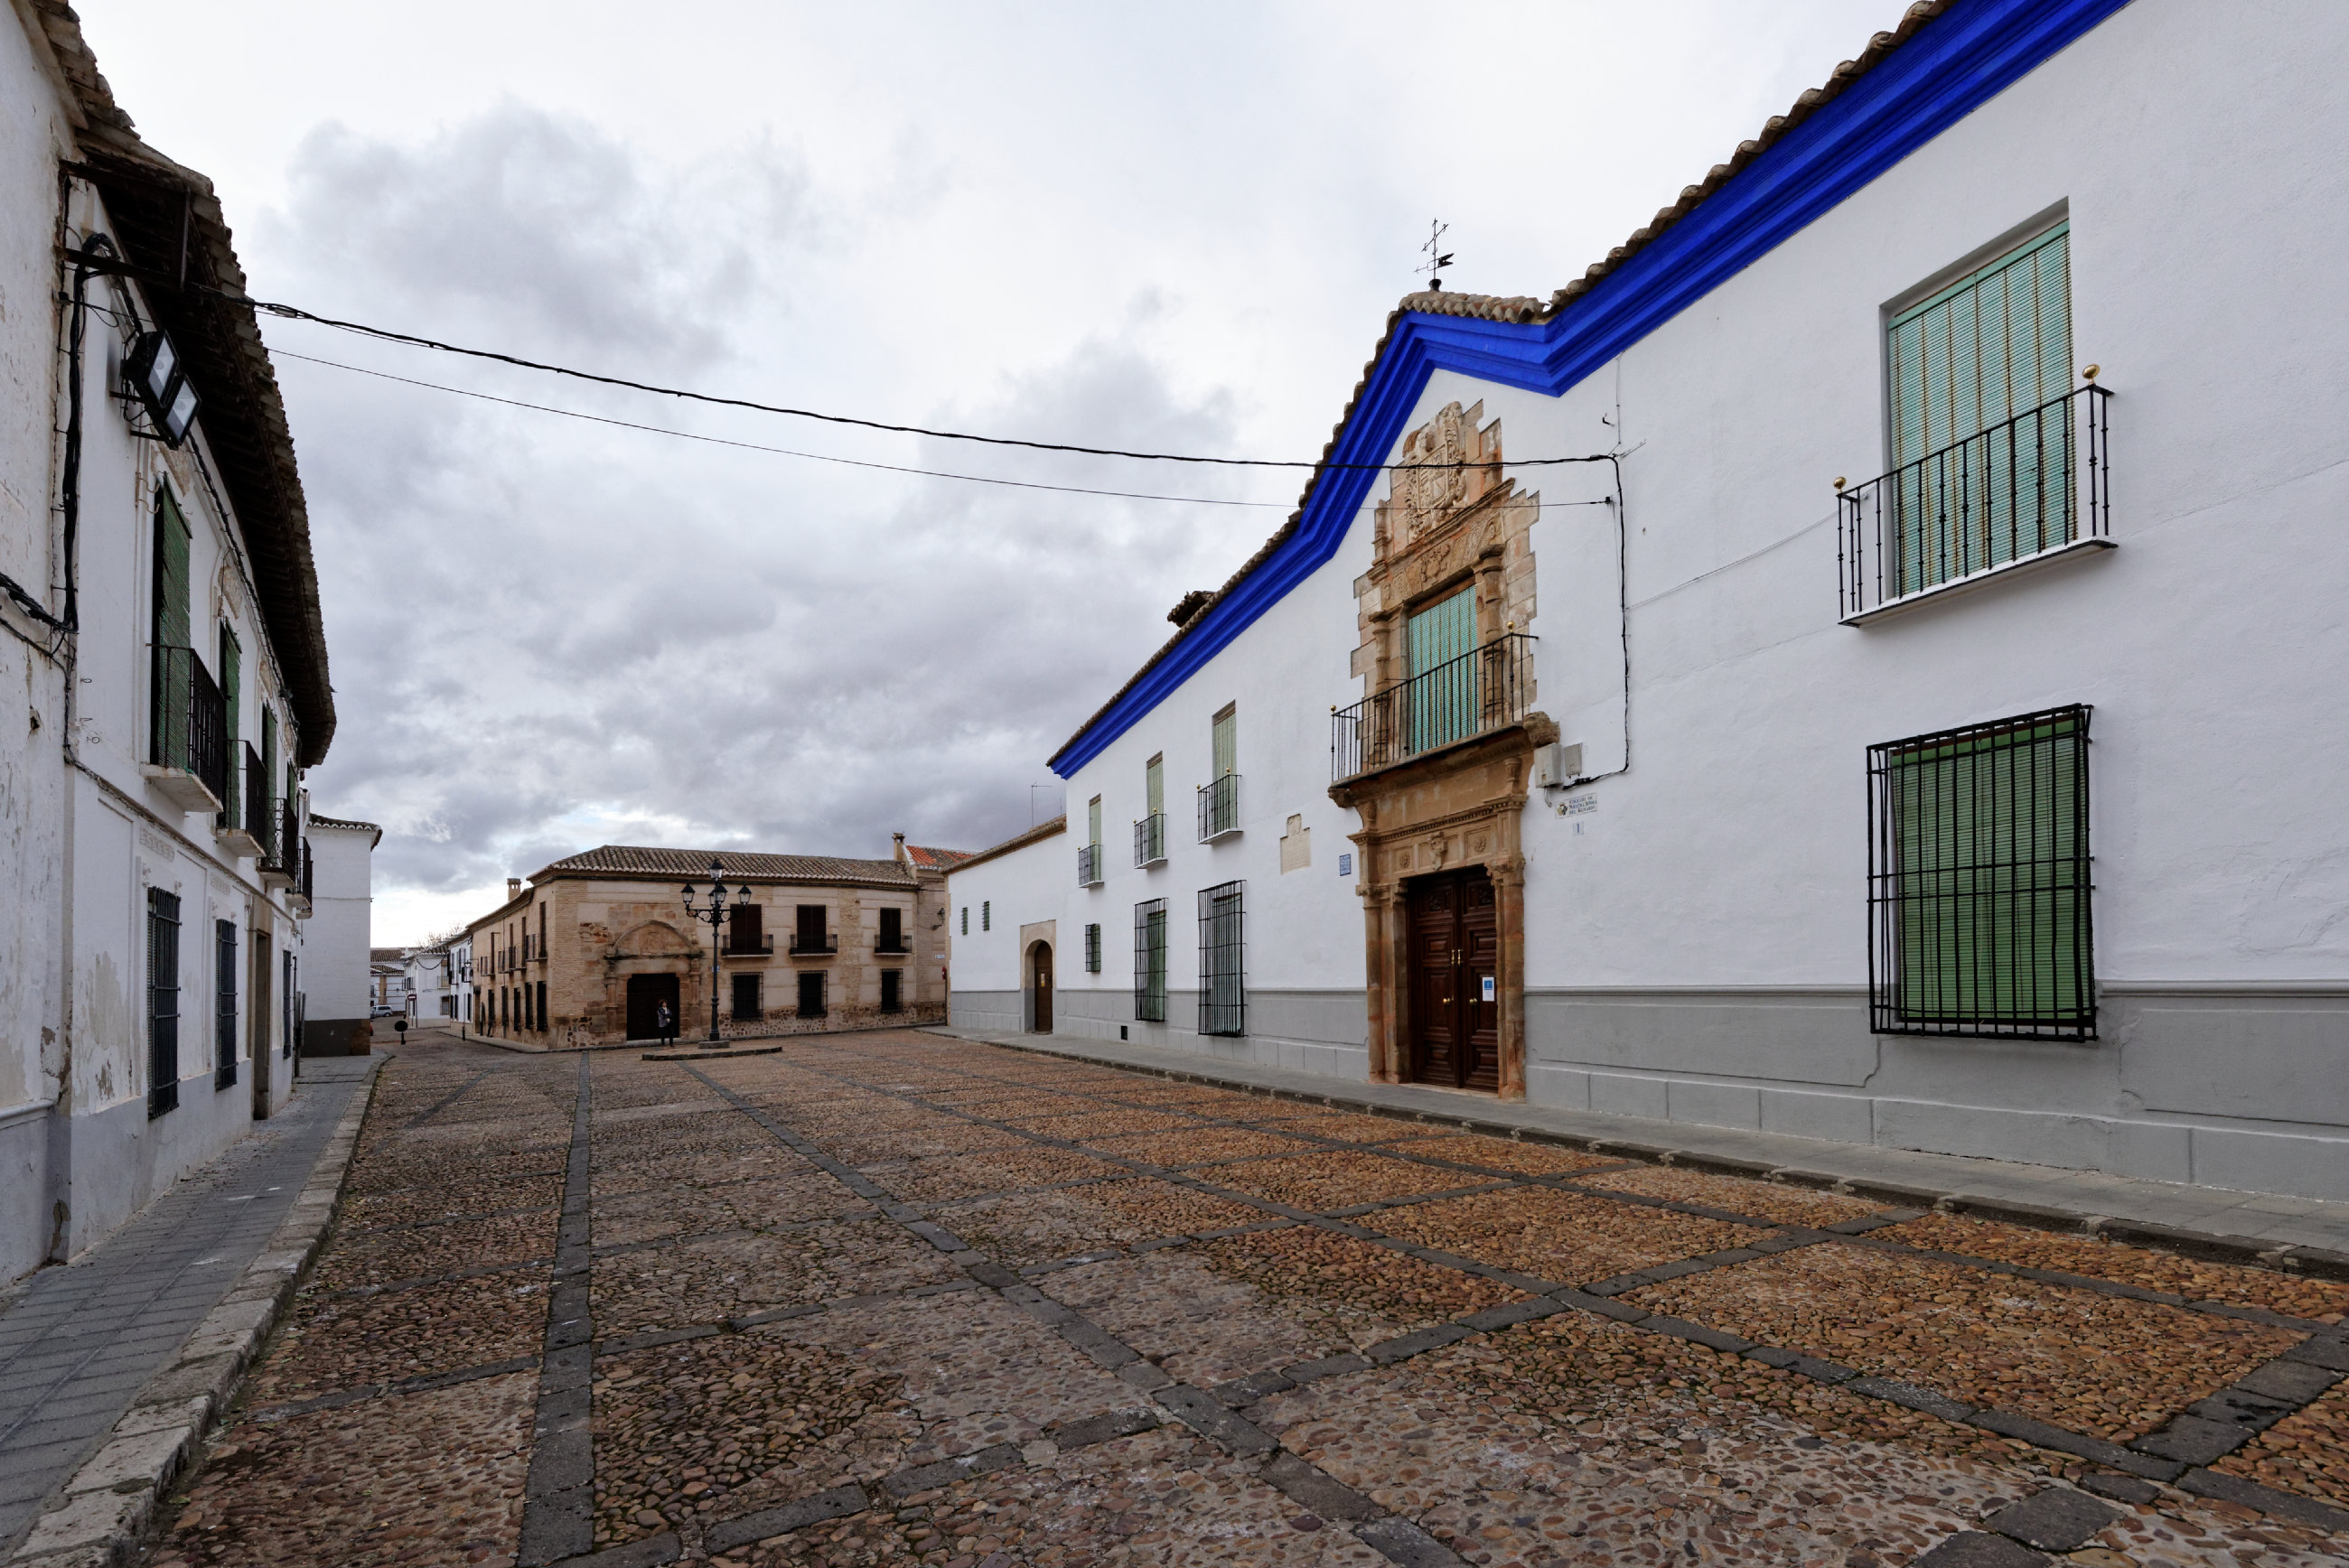 151102-Almagro (62)